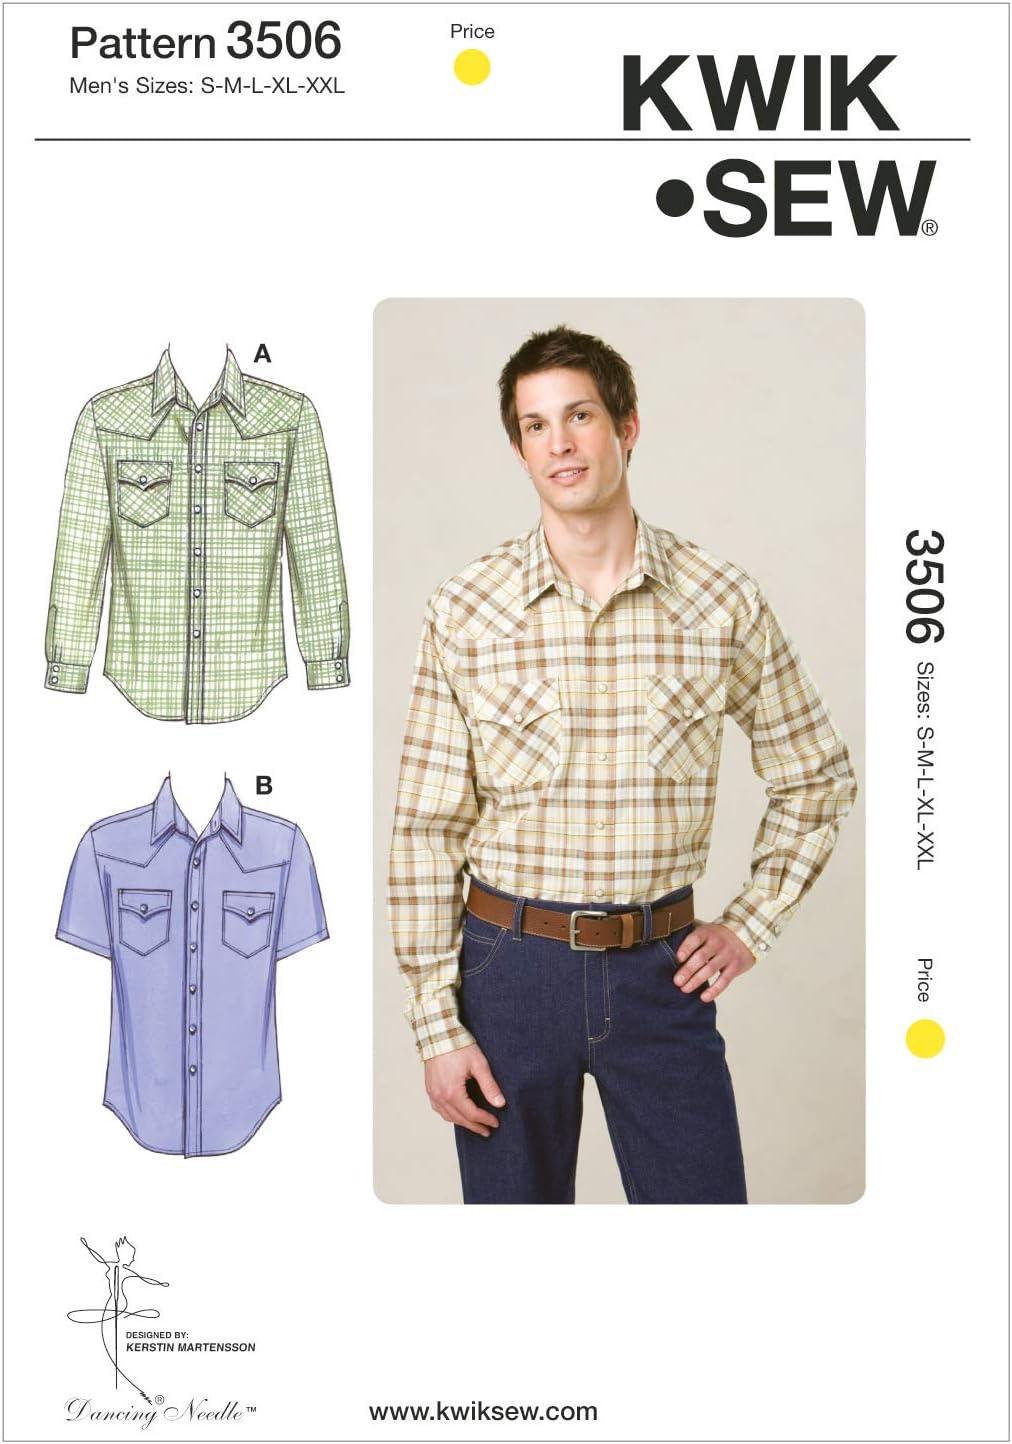 Kwik Sew K3878 Shirts Sewing Pattern Size S-M-L-XL-XXL